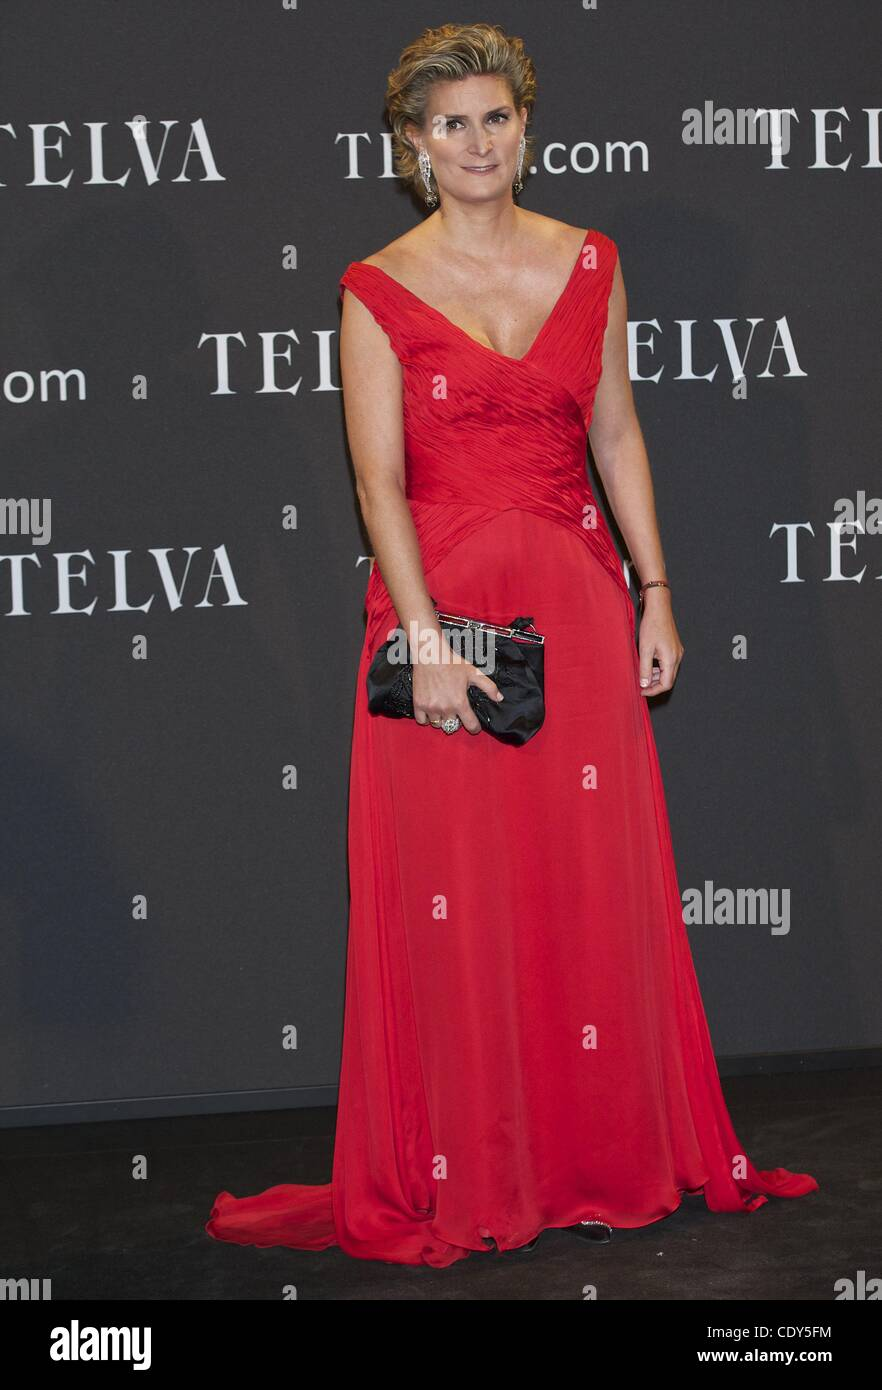 Oct. 24, 2011 - Madrid, Madrid, Spain - Maria Zurita attends 'Telva' Awards 2011 at Palacio de Cibeles on - Stock Image